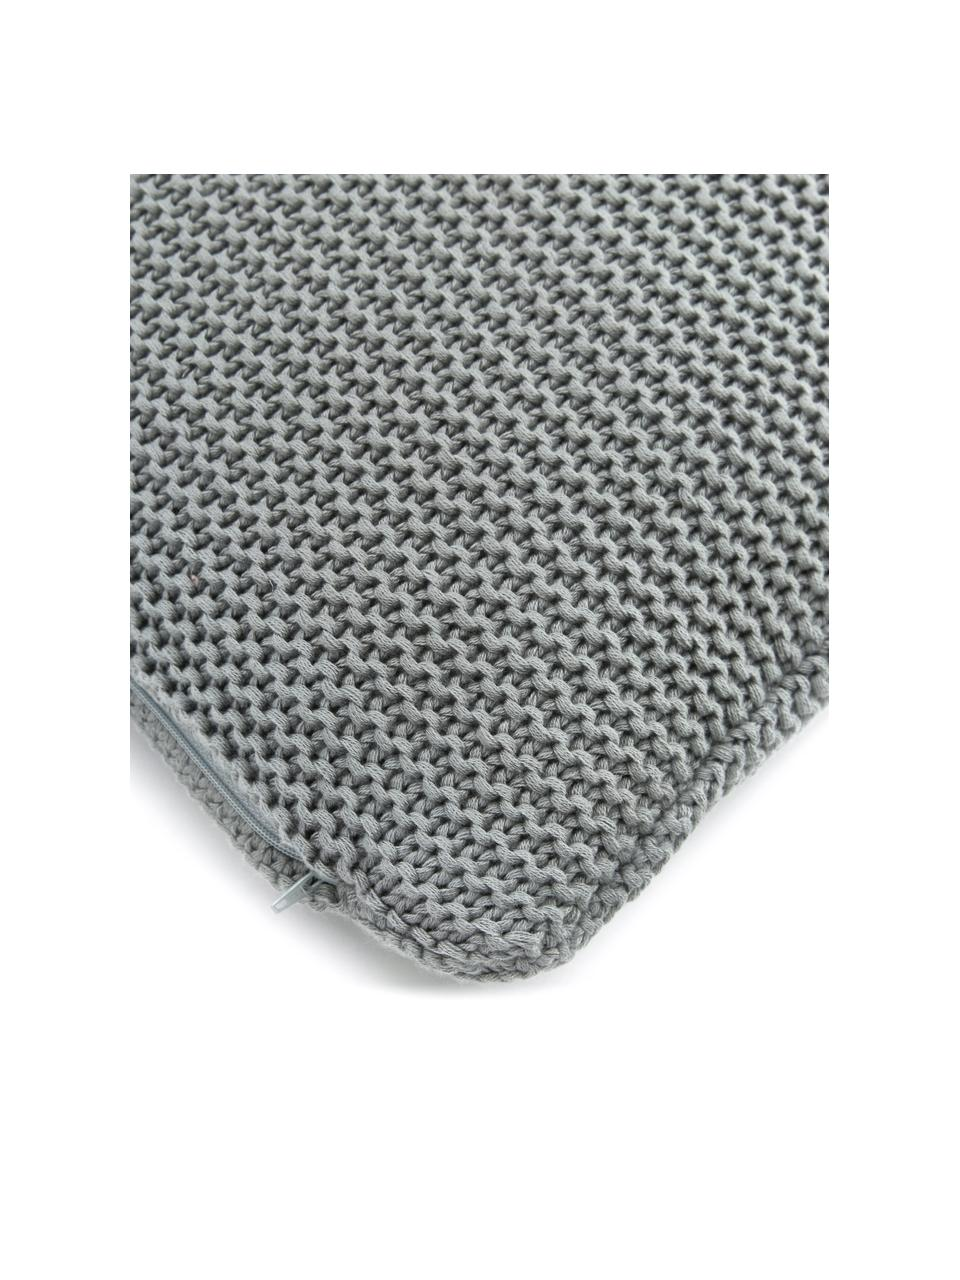 Federa arredo a maglia in cotone biologico verde salvia Adalyn, 100% cotone biologico, certificato GOTS, Verde salvia, Larg. 60 x Lung. 60 cm